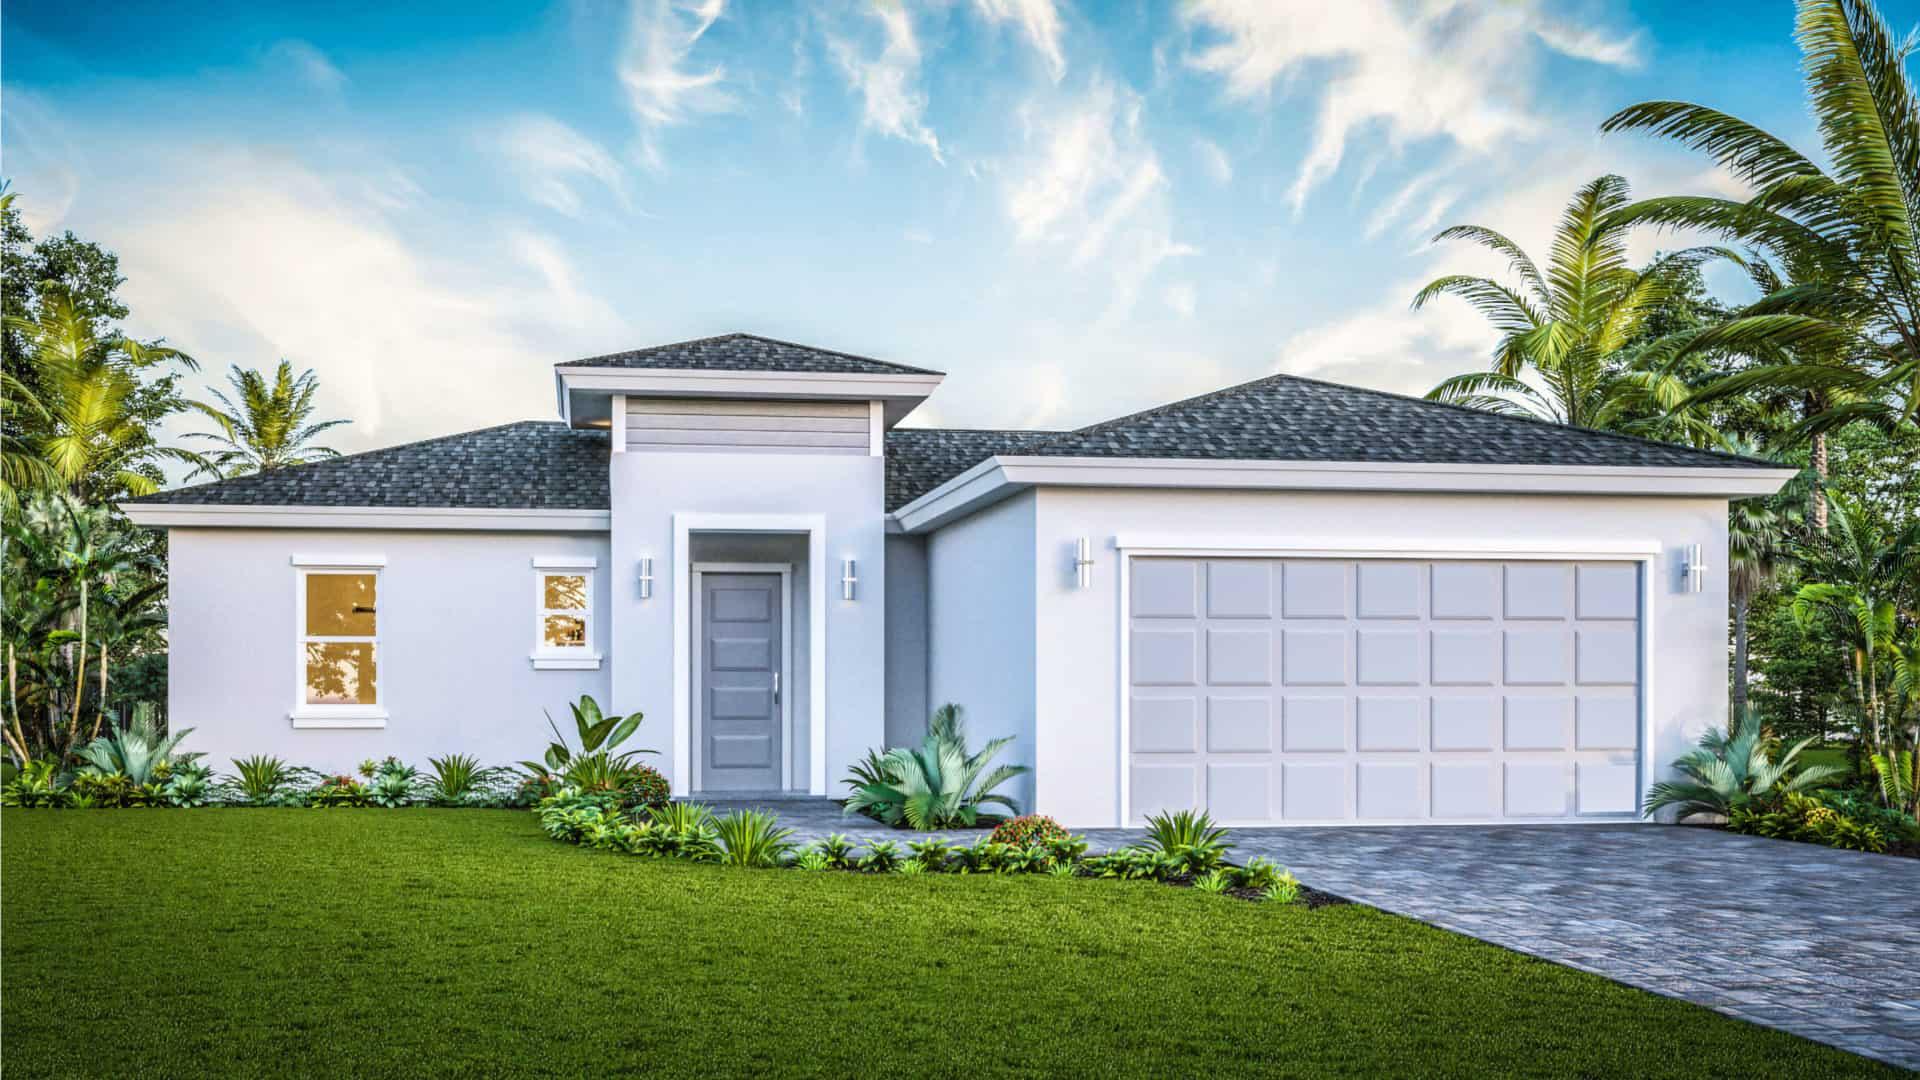 White and Grey House - Kaye Lifestyle Homes